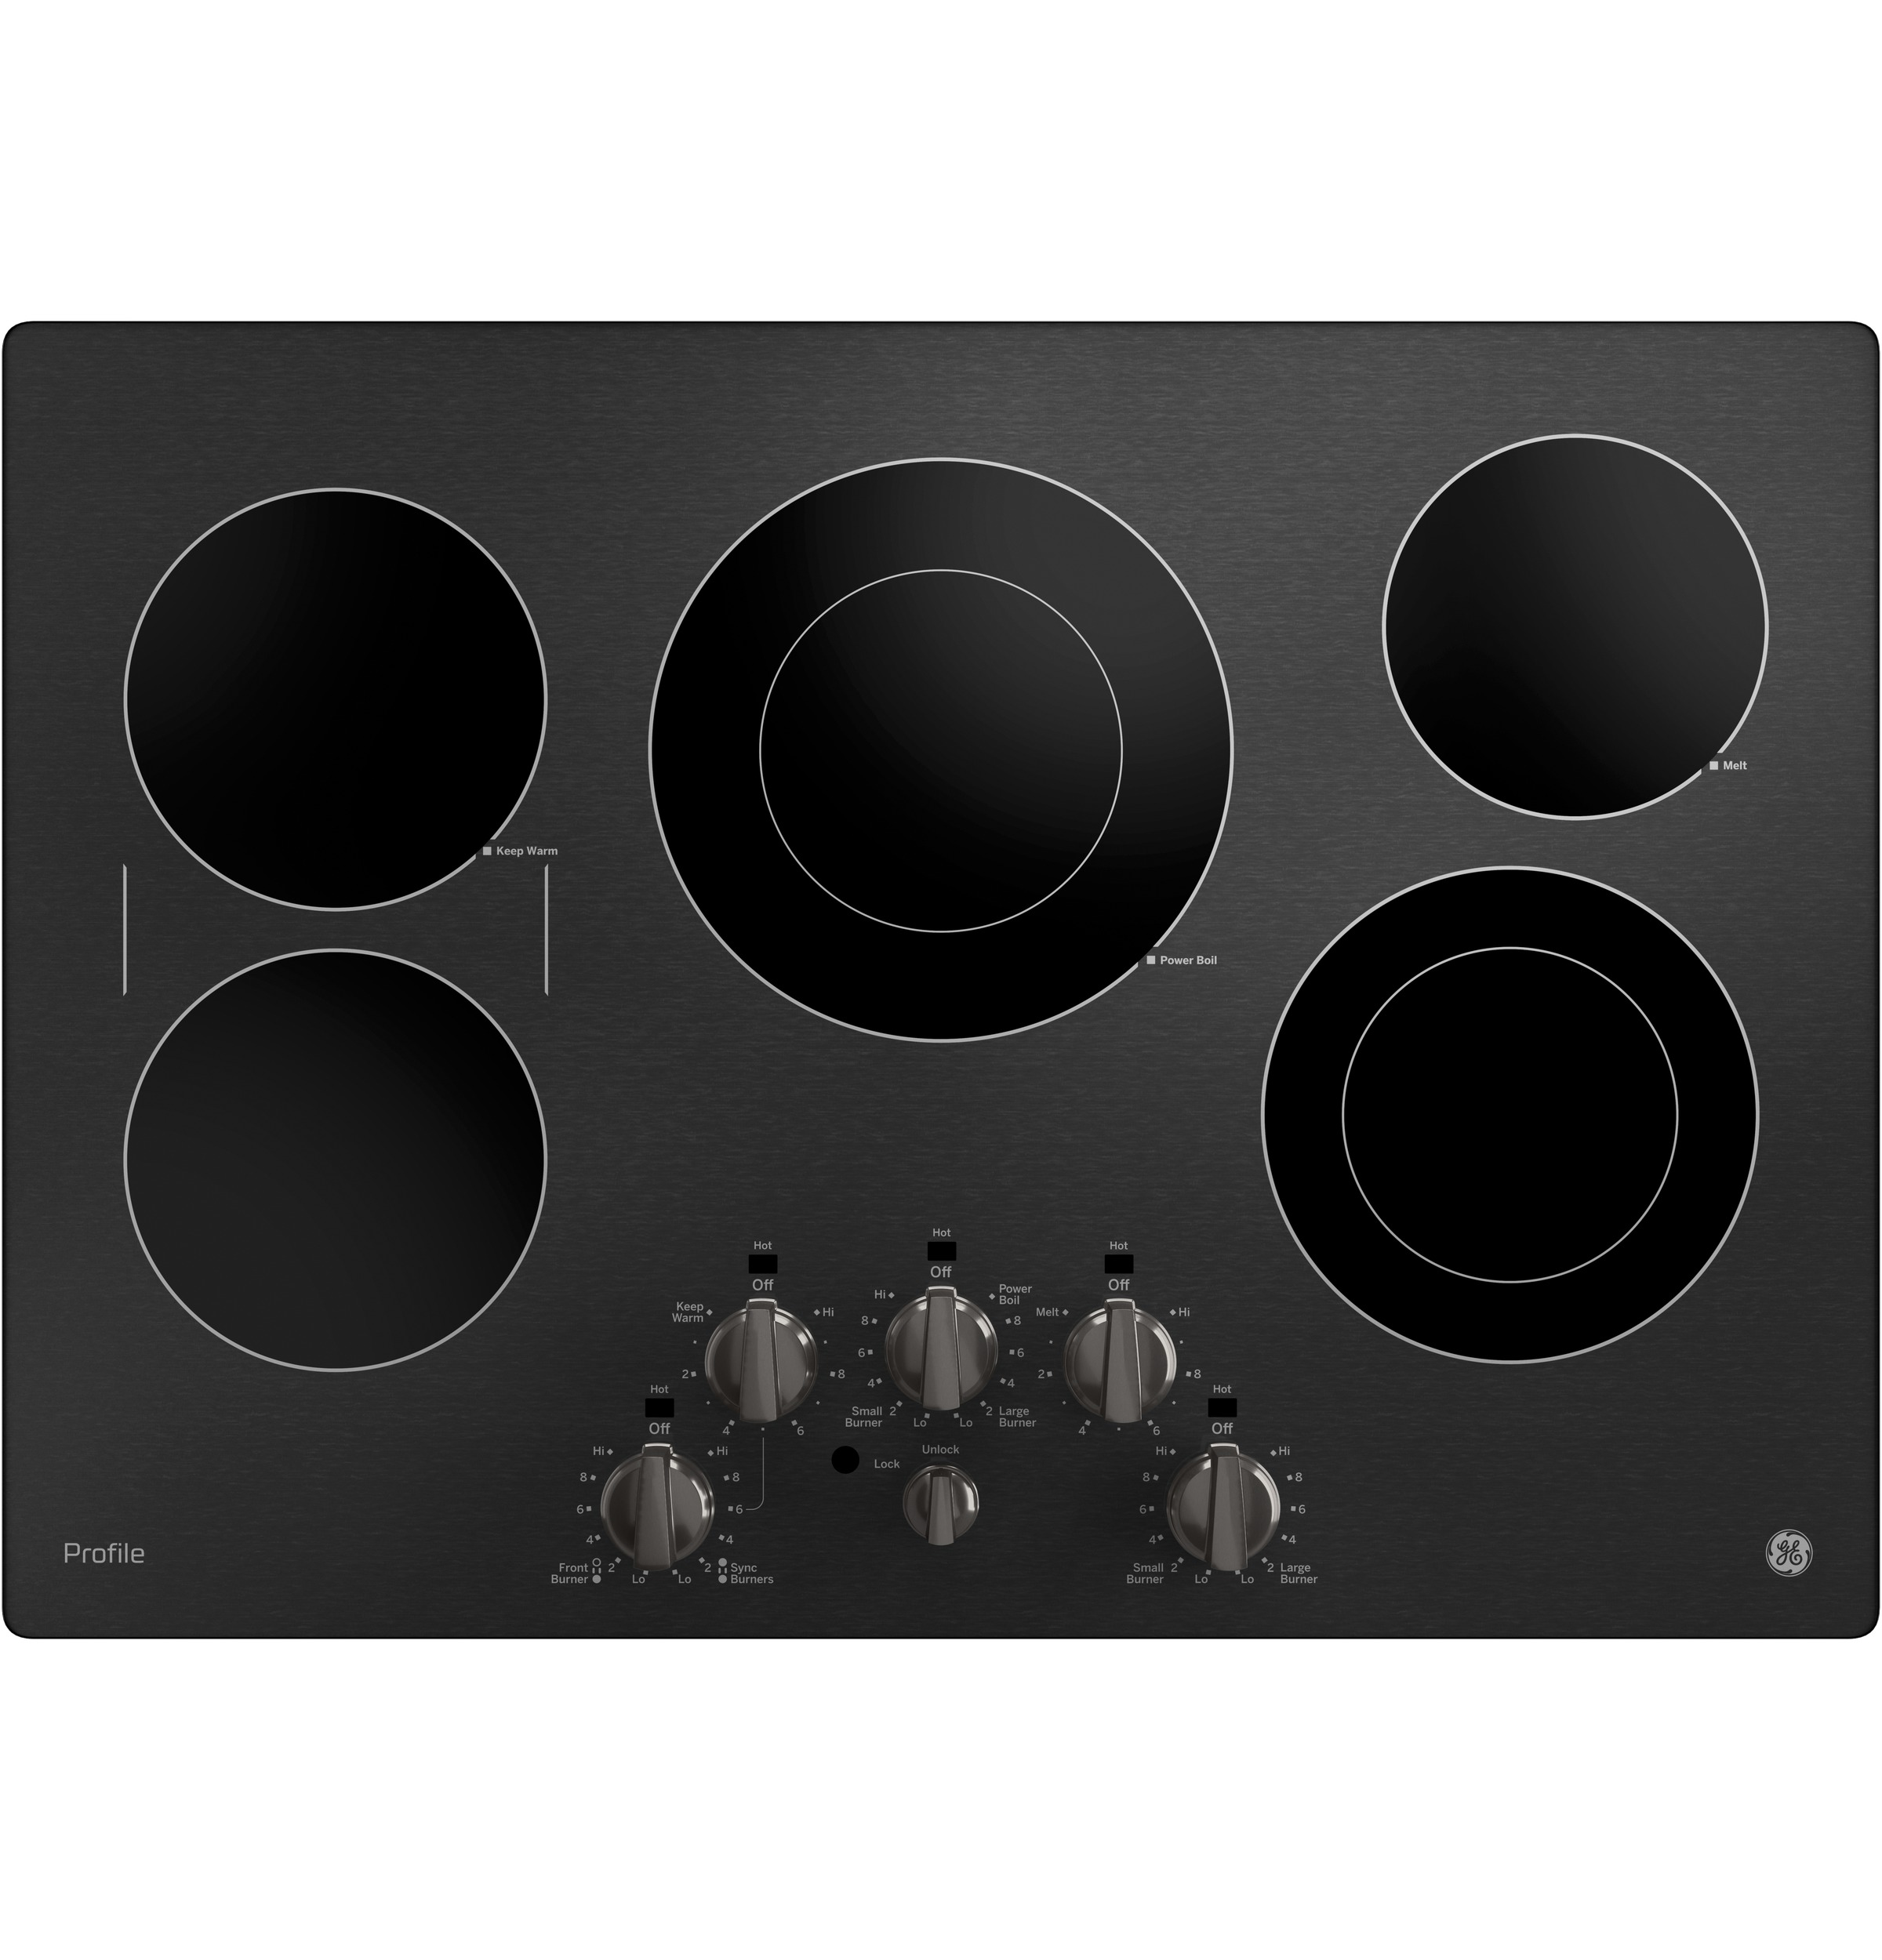 "GE Profile GE Profile™ 30"" Built-In Knob Control Electric Cooktop"